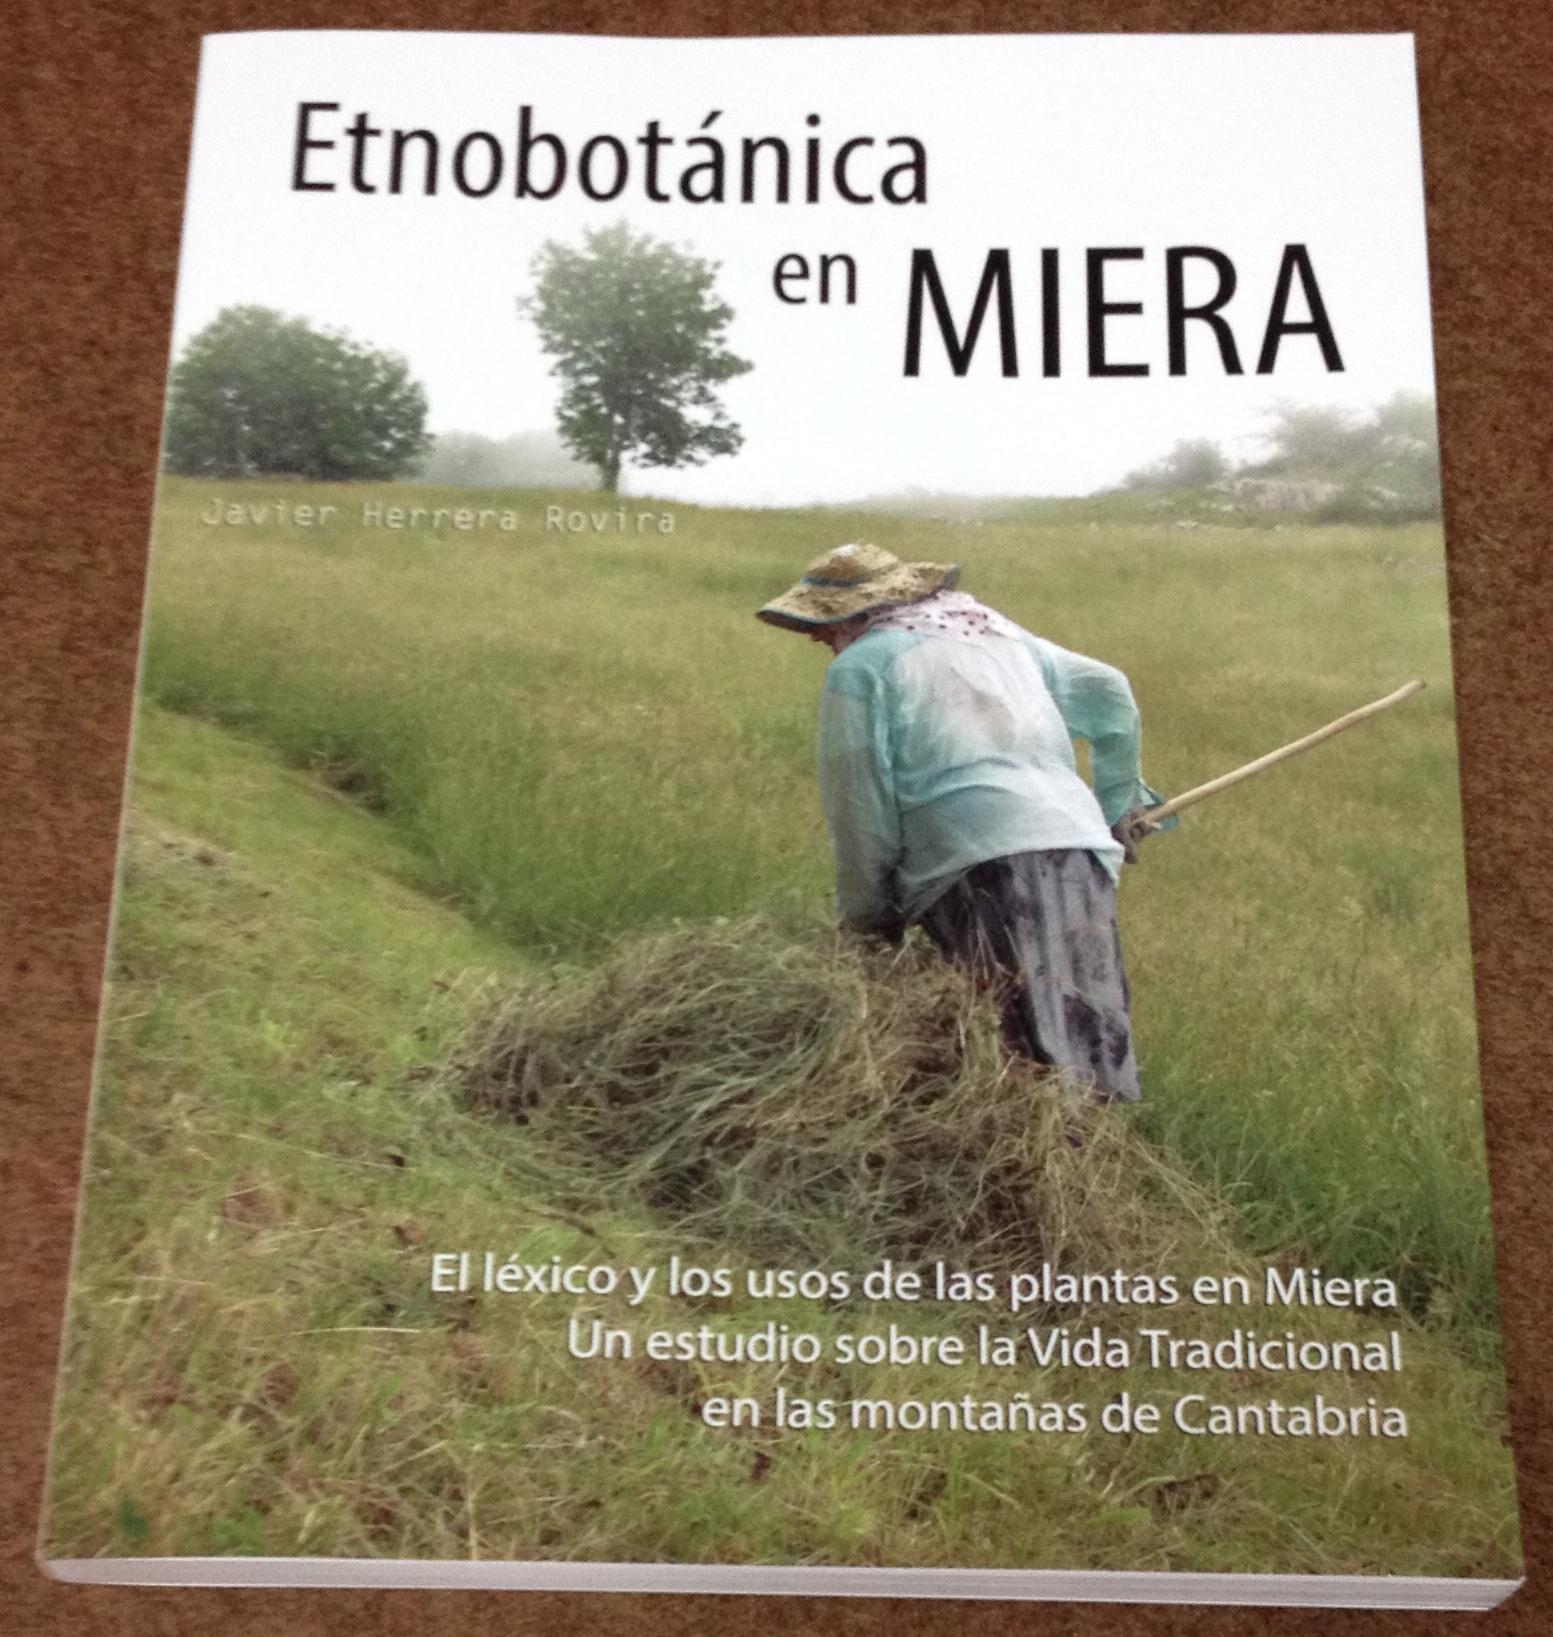 Charla Etnobotánica en Miera